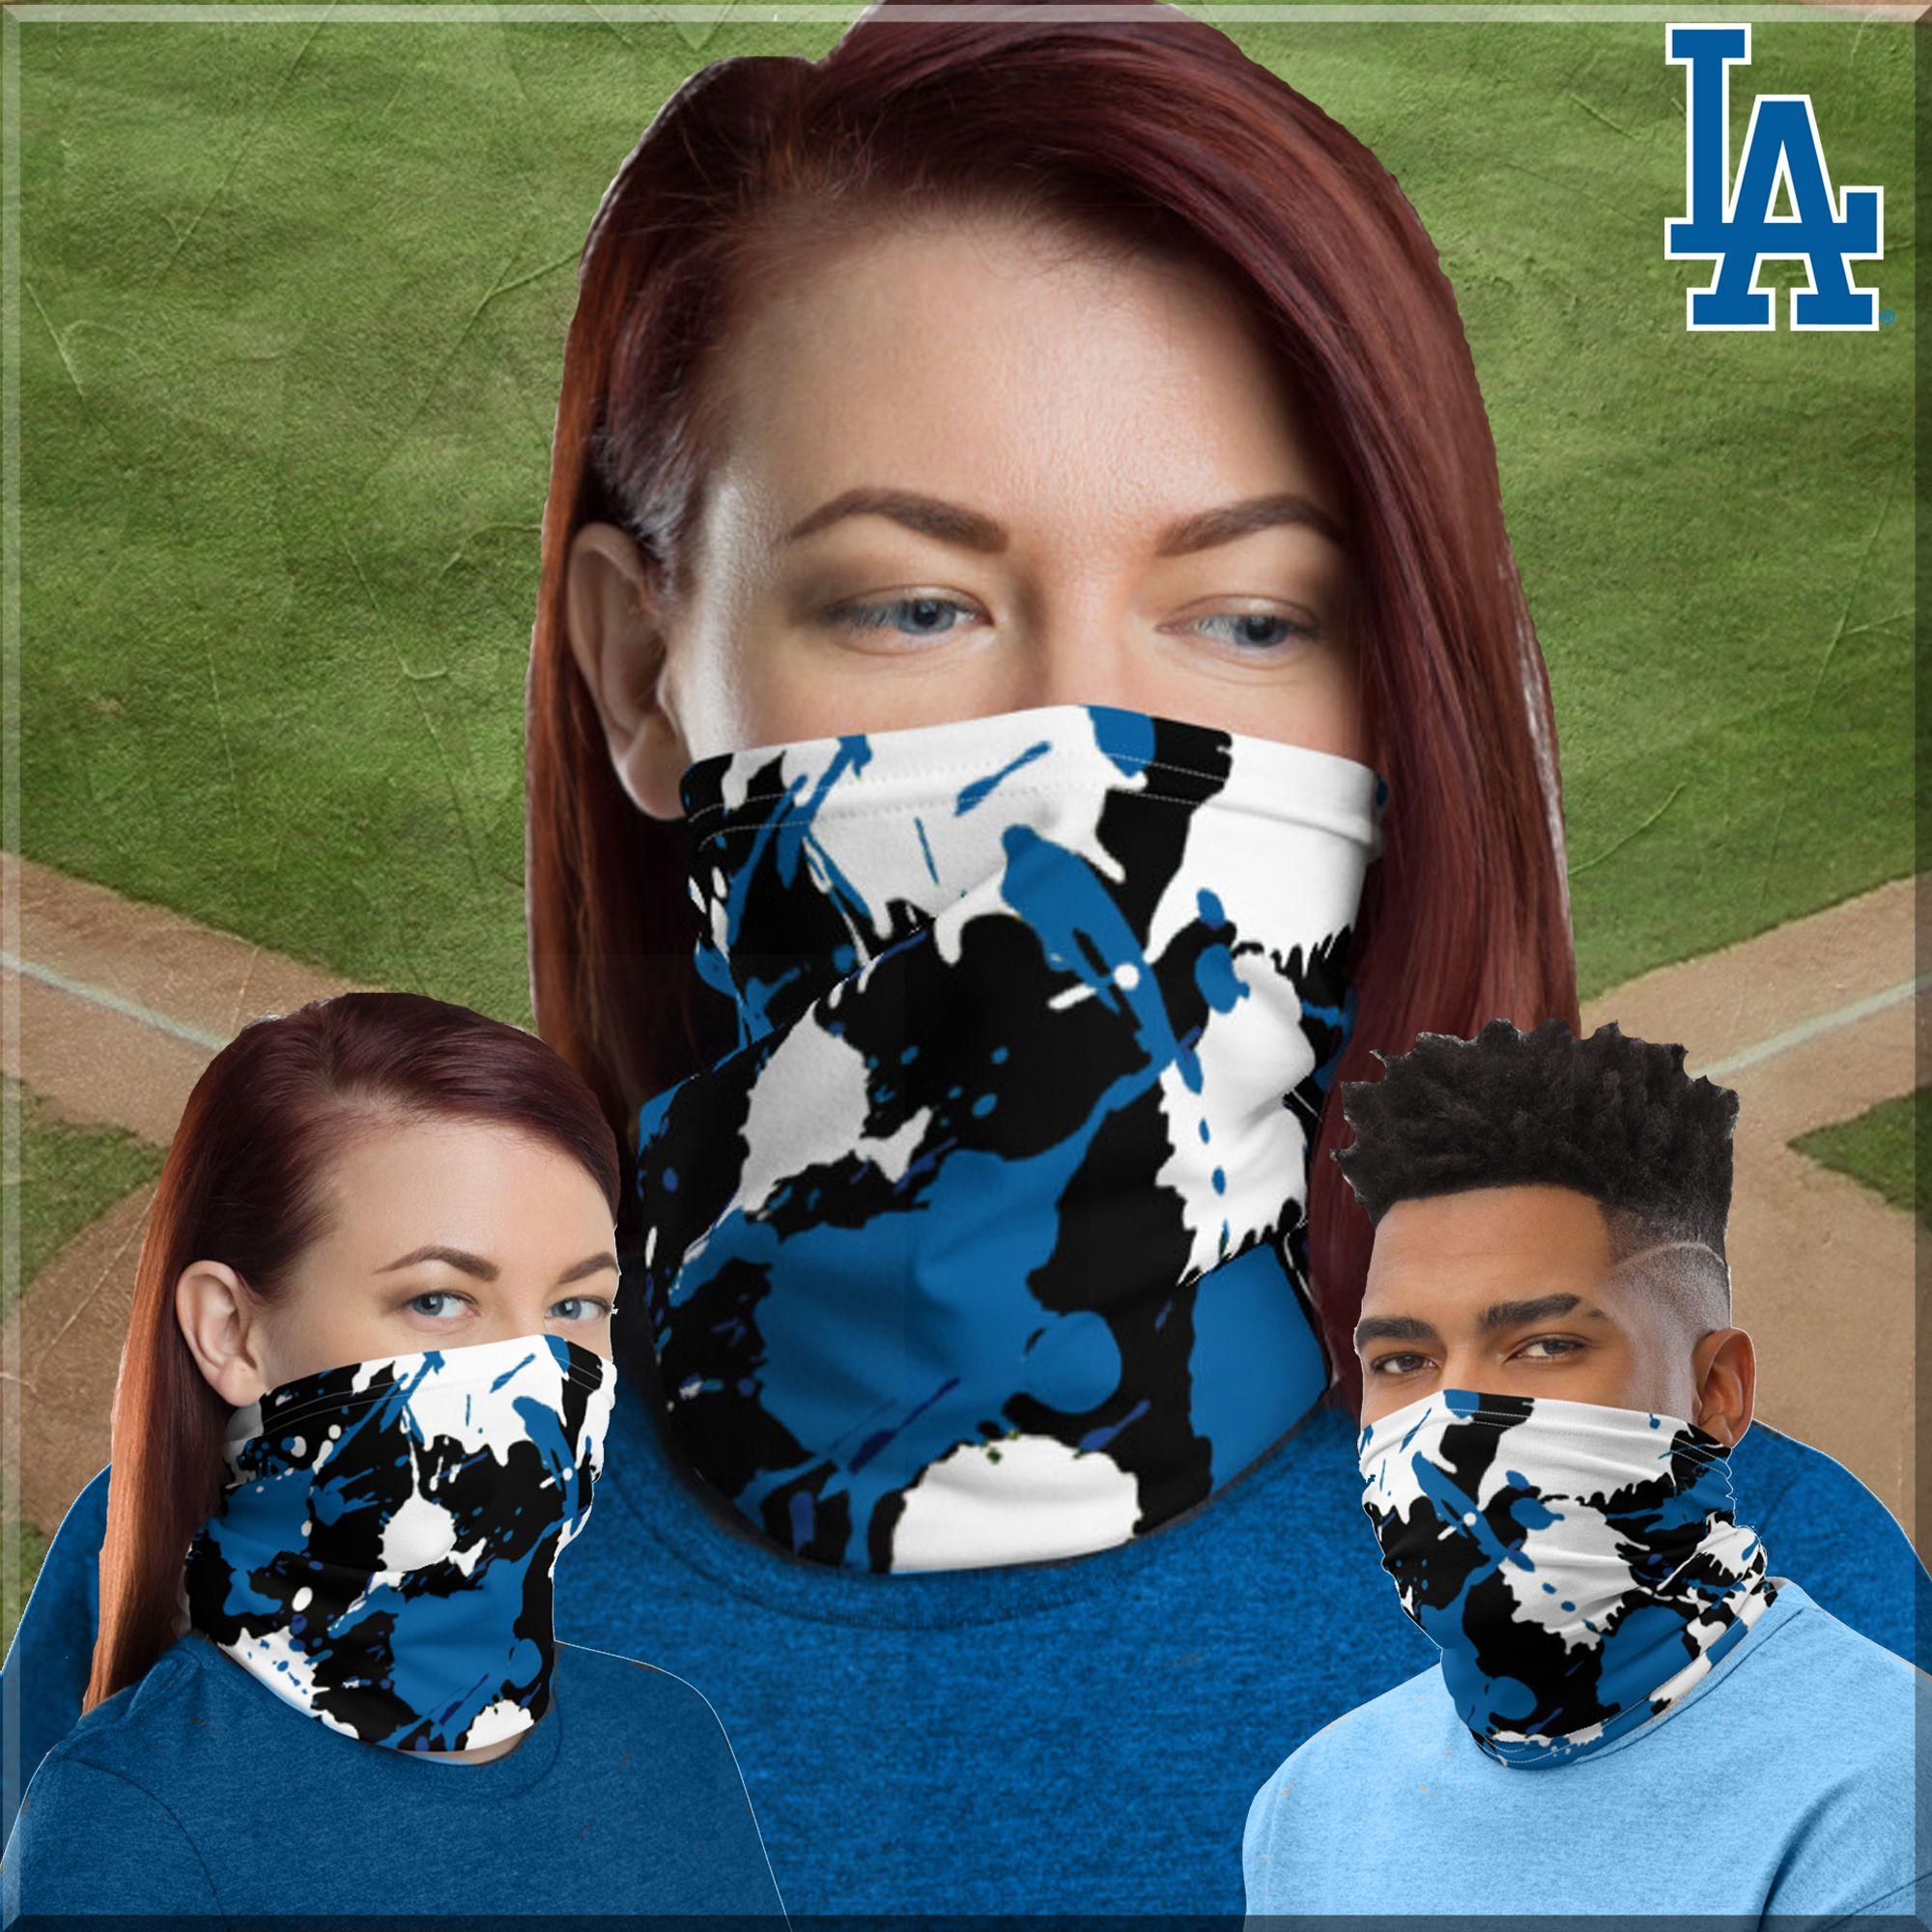 Nl West Mlb Baseball Diamondbacks Dodgers Giants Padres Rockies Inspired Neck Gaiter Face Cover Bandana Headband Face Mask Urban Street Wear In 2020 La Dodgers Baseball Baseball Inspired La Dodgers